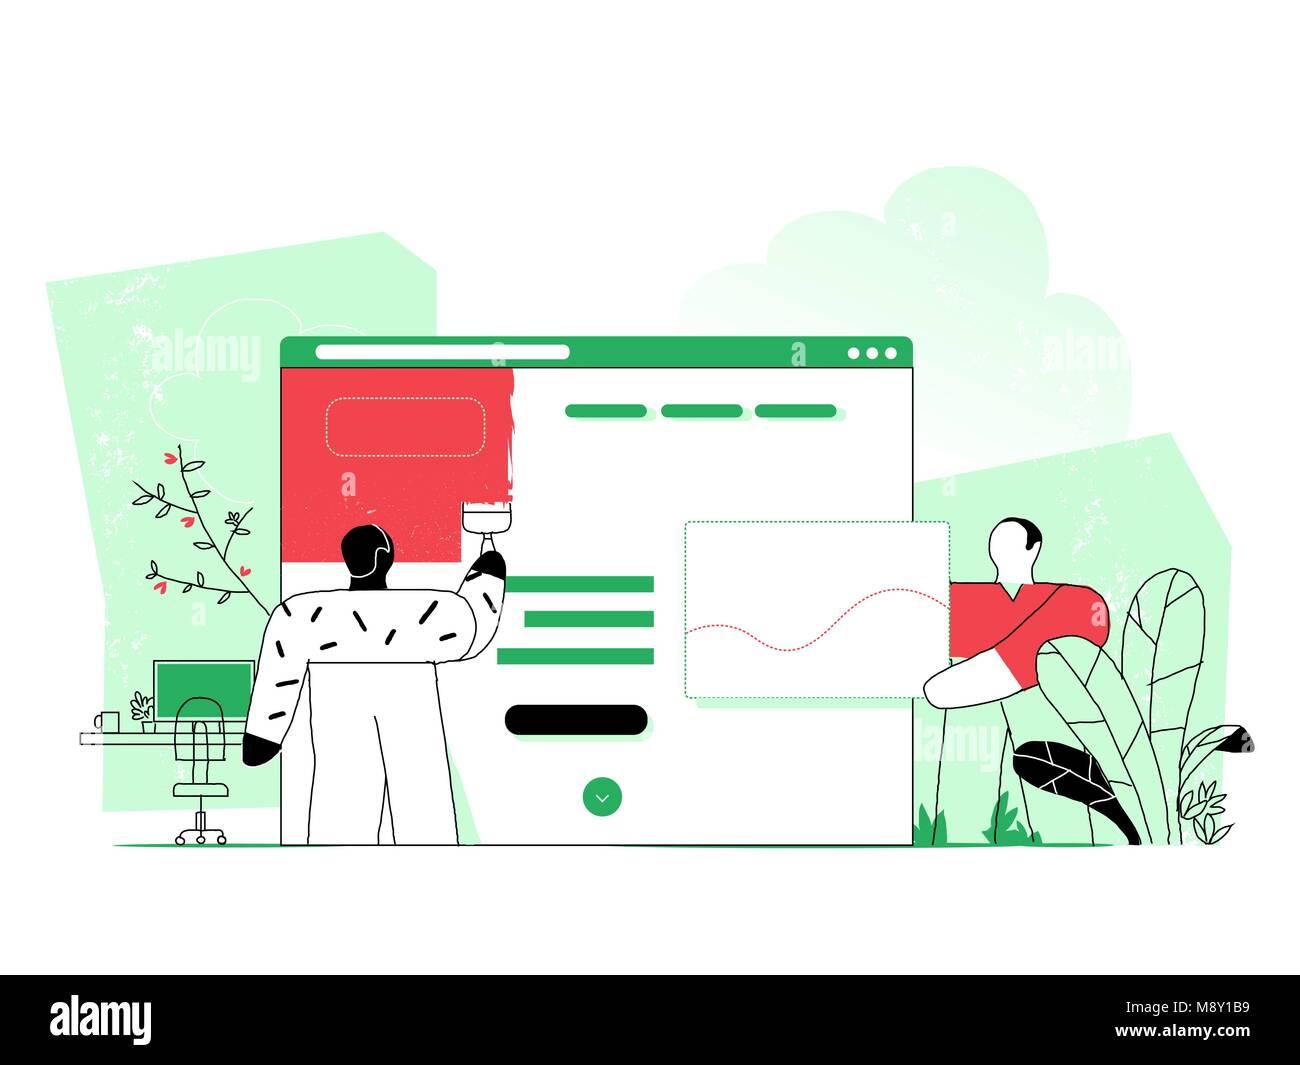 Web designer planning visual design for web project - Stock Image